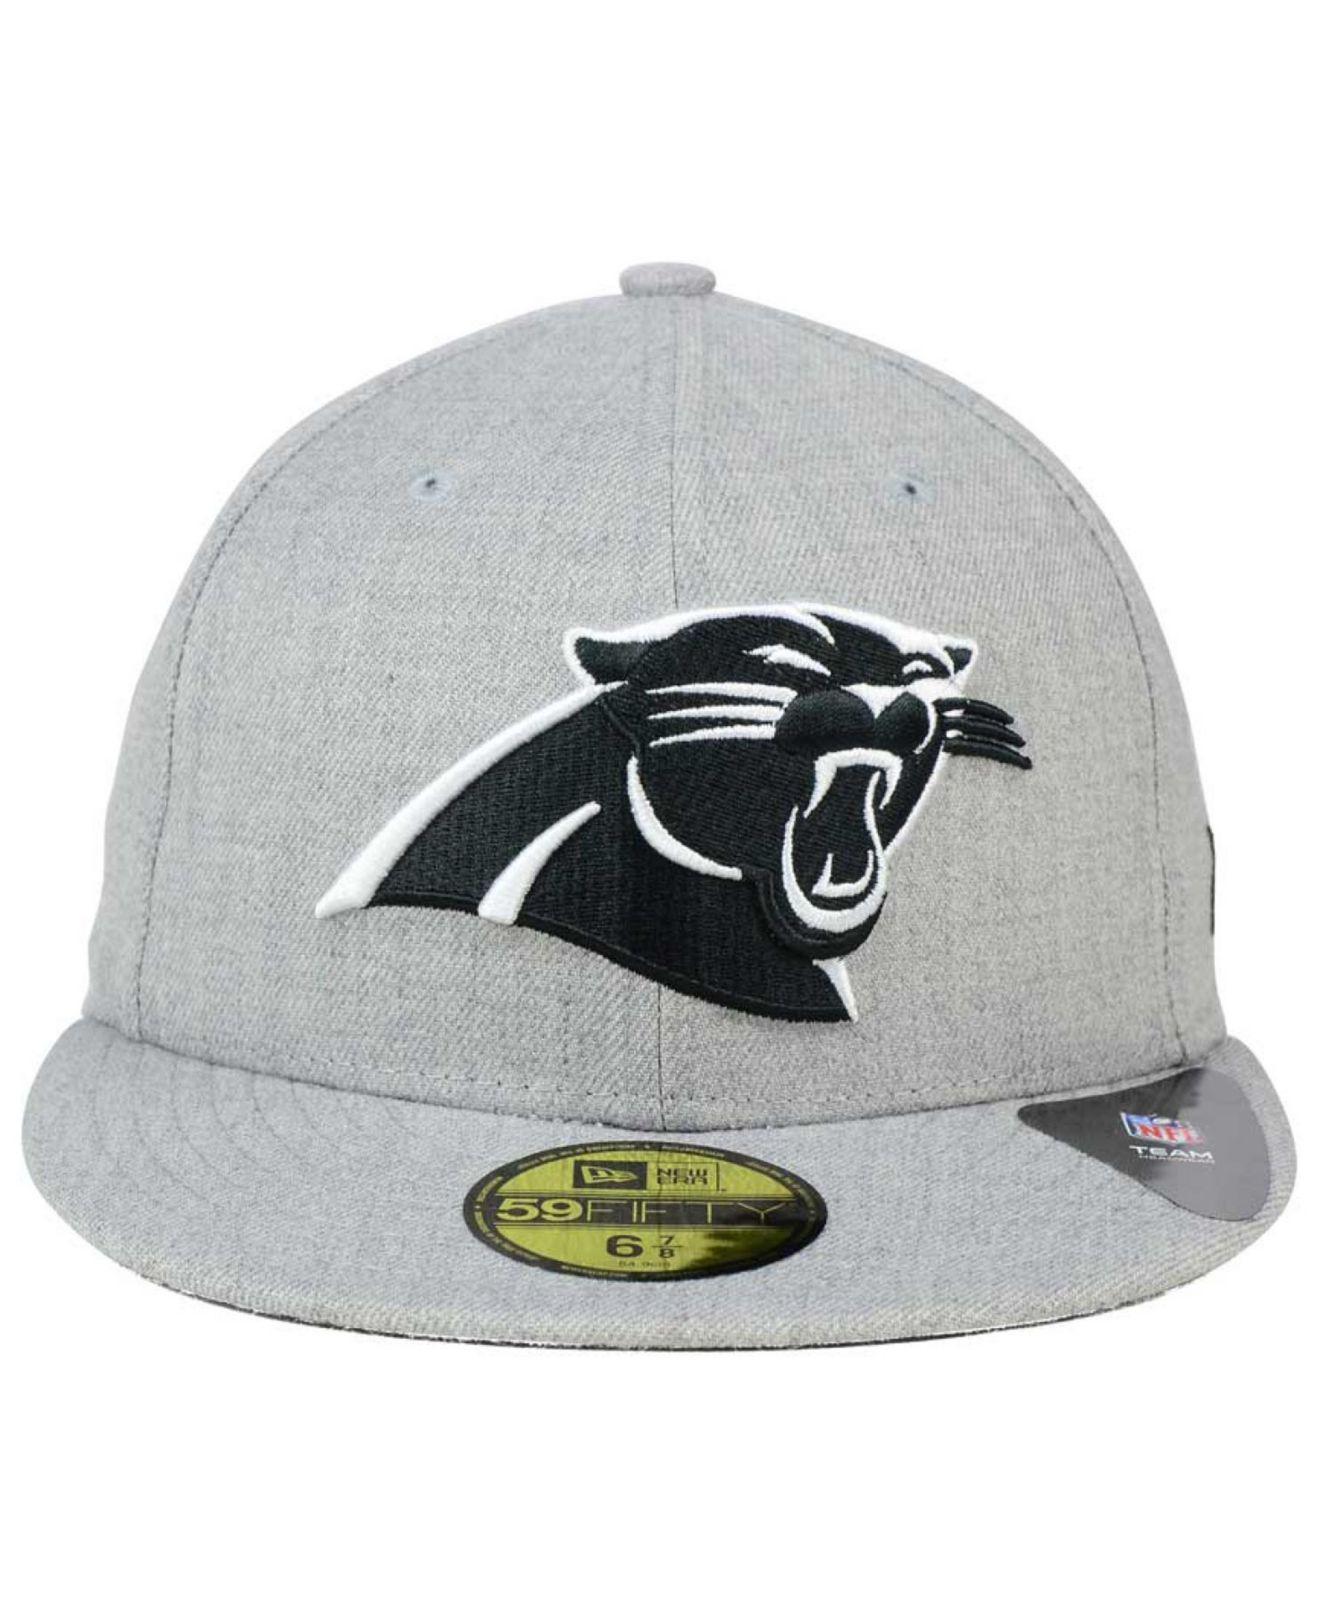 Lyst - KTZ Carolina Panthers Heather Black White 59fifty Cap in Gray for Men af0c8d240